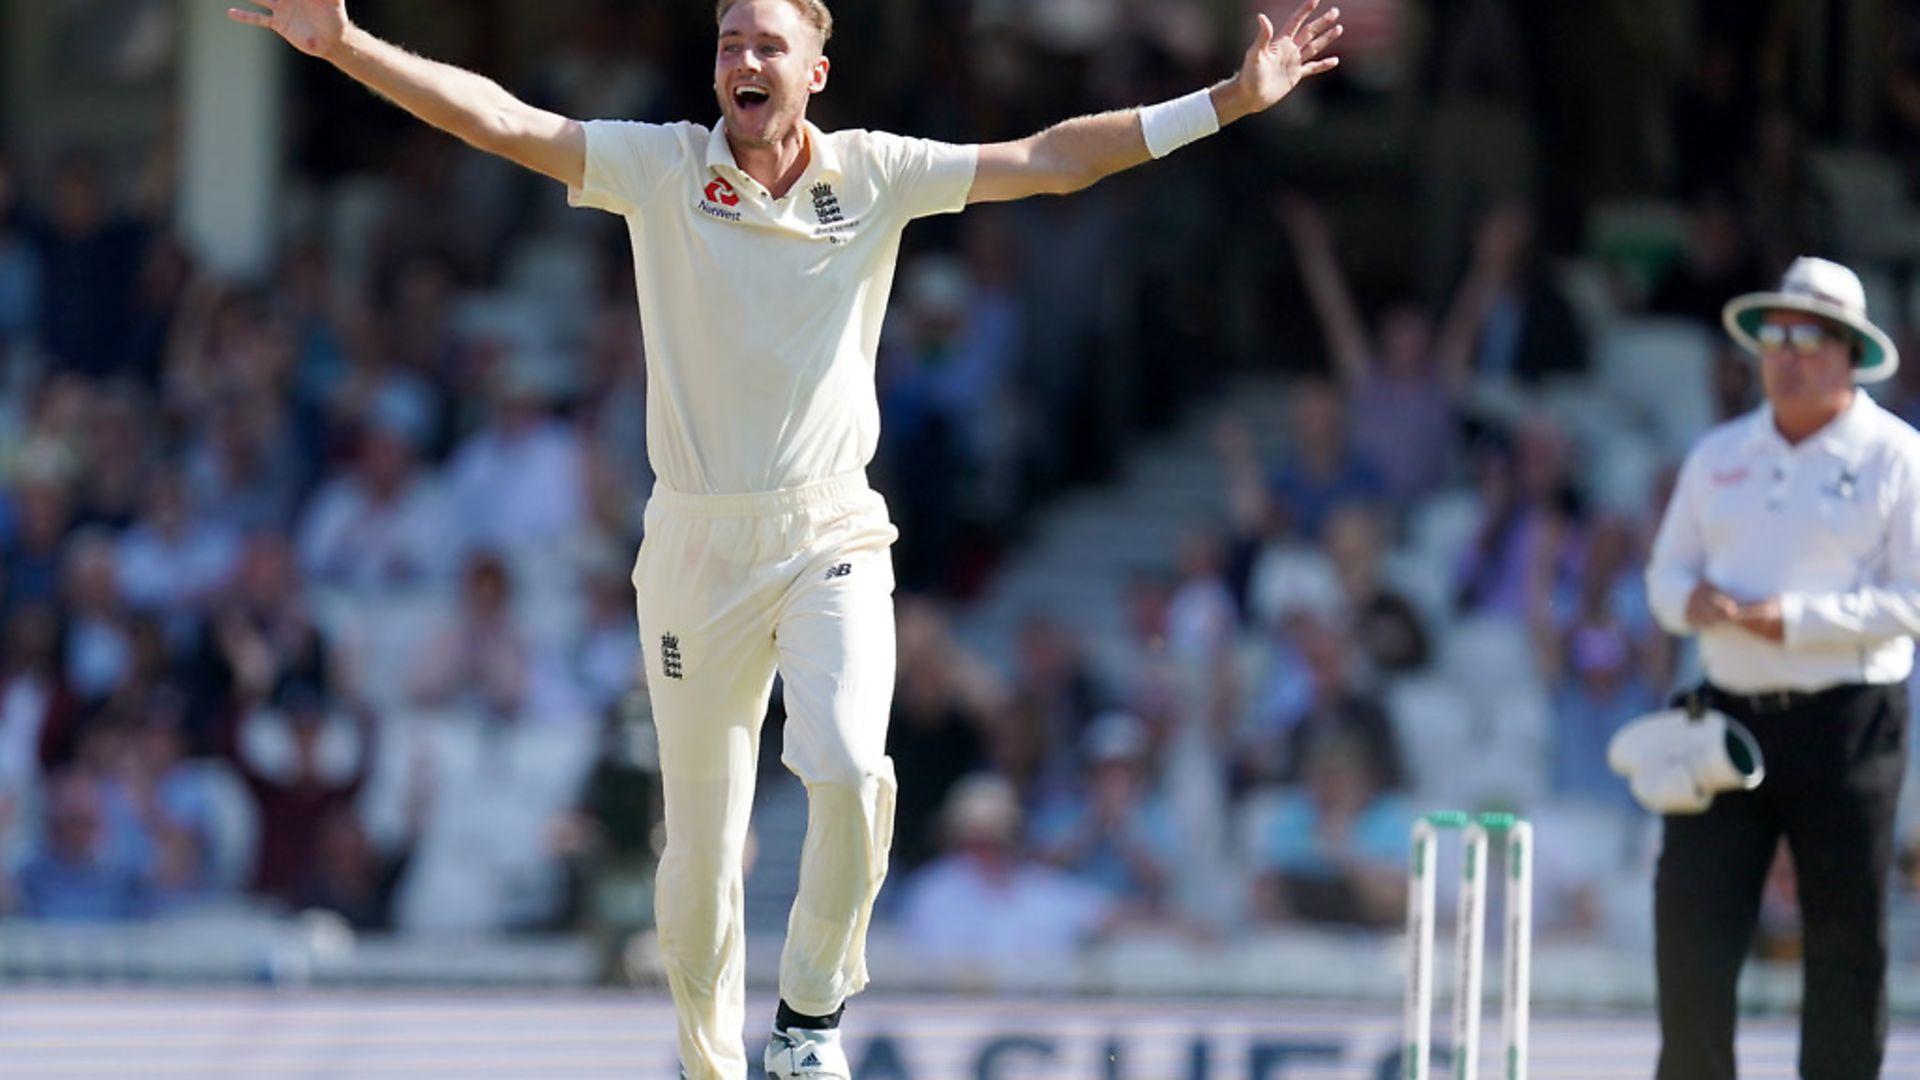 England cricketer Stuart Broad. Picture: PA/John Walton - Credit: PA Wire/PA Images